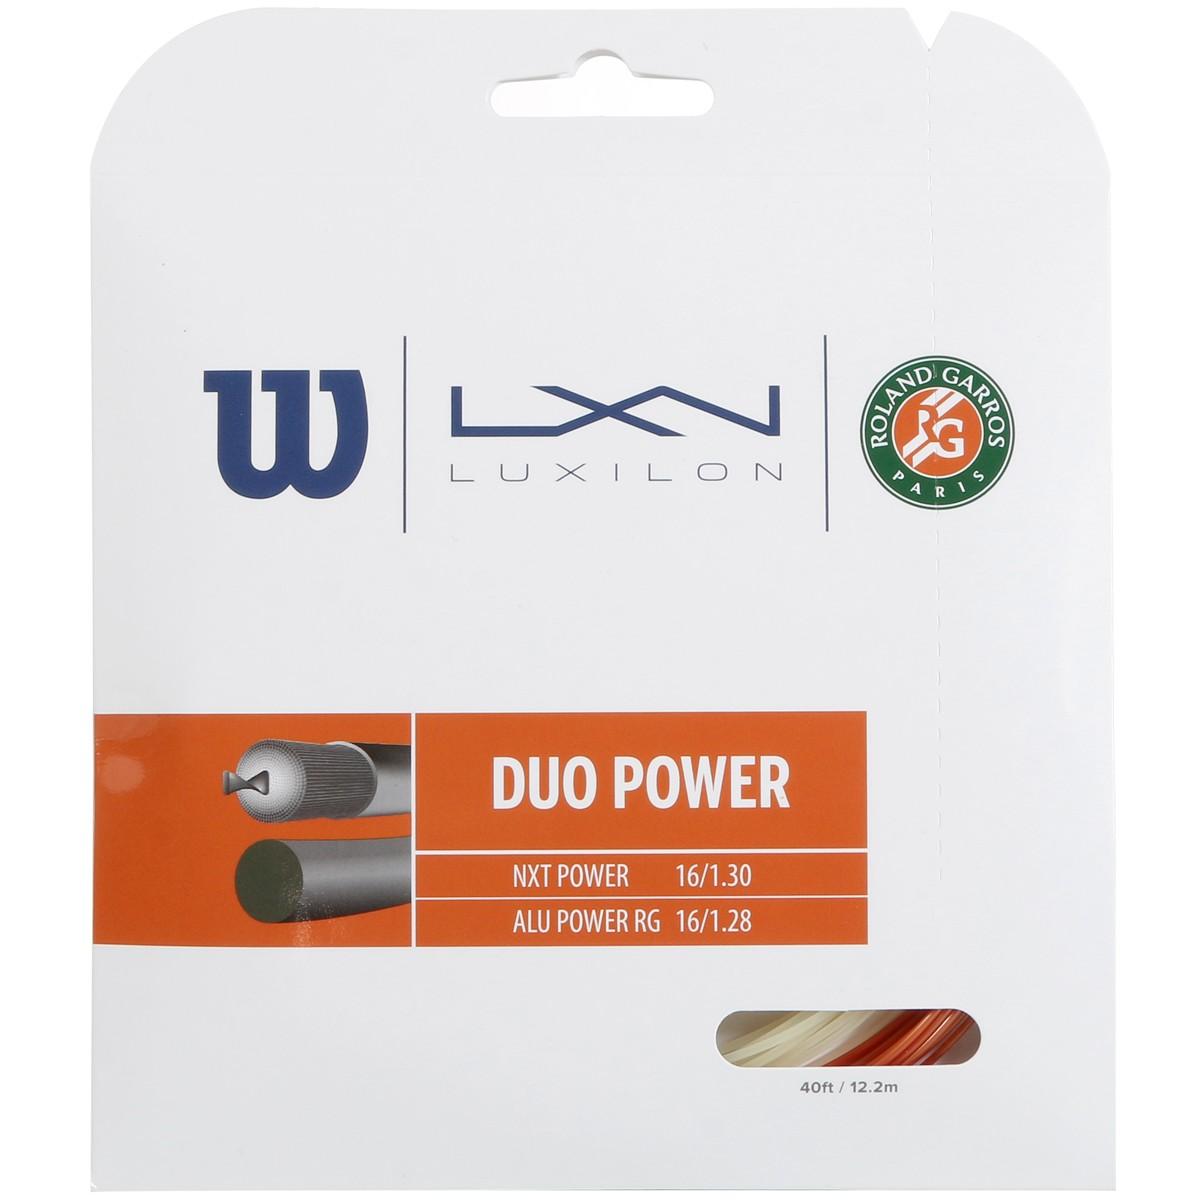 CORDAGE WILSON DUO POWER ROLAND GARROS : LUXILON ALU POWER & WILSON NXT POWER 1.25 (12.20 METRES)